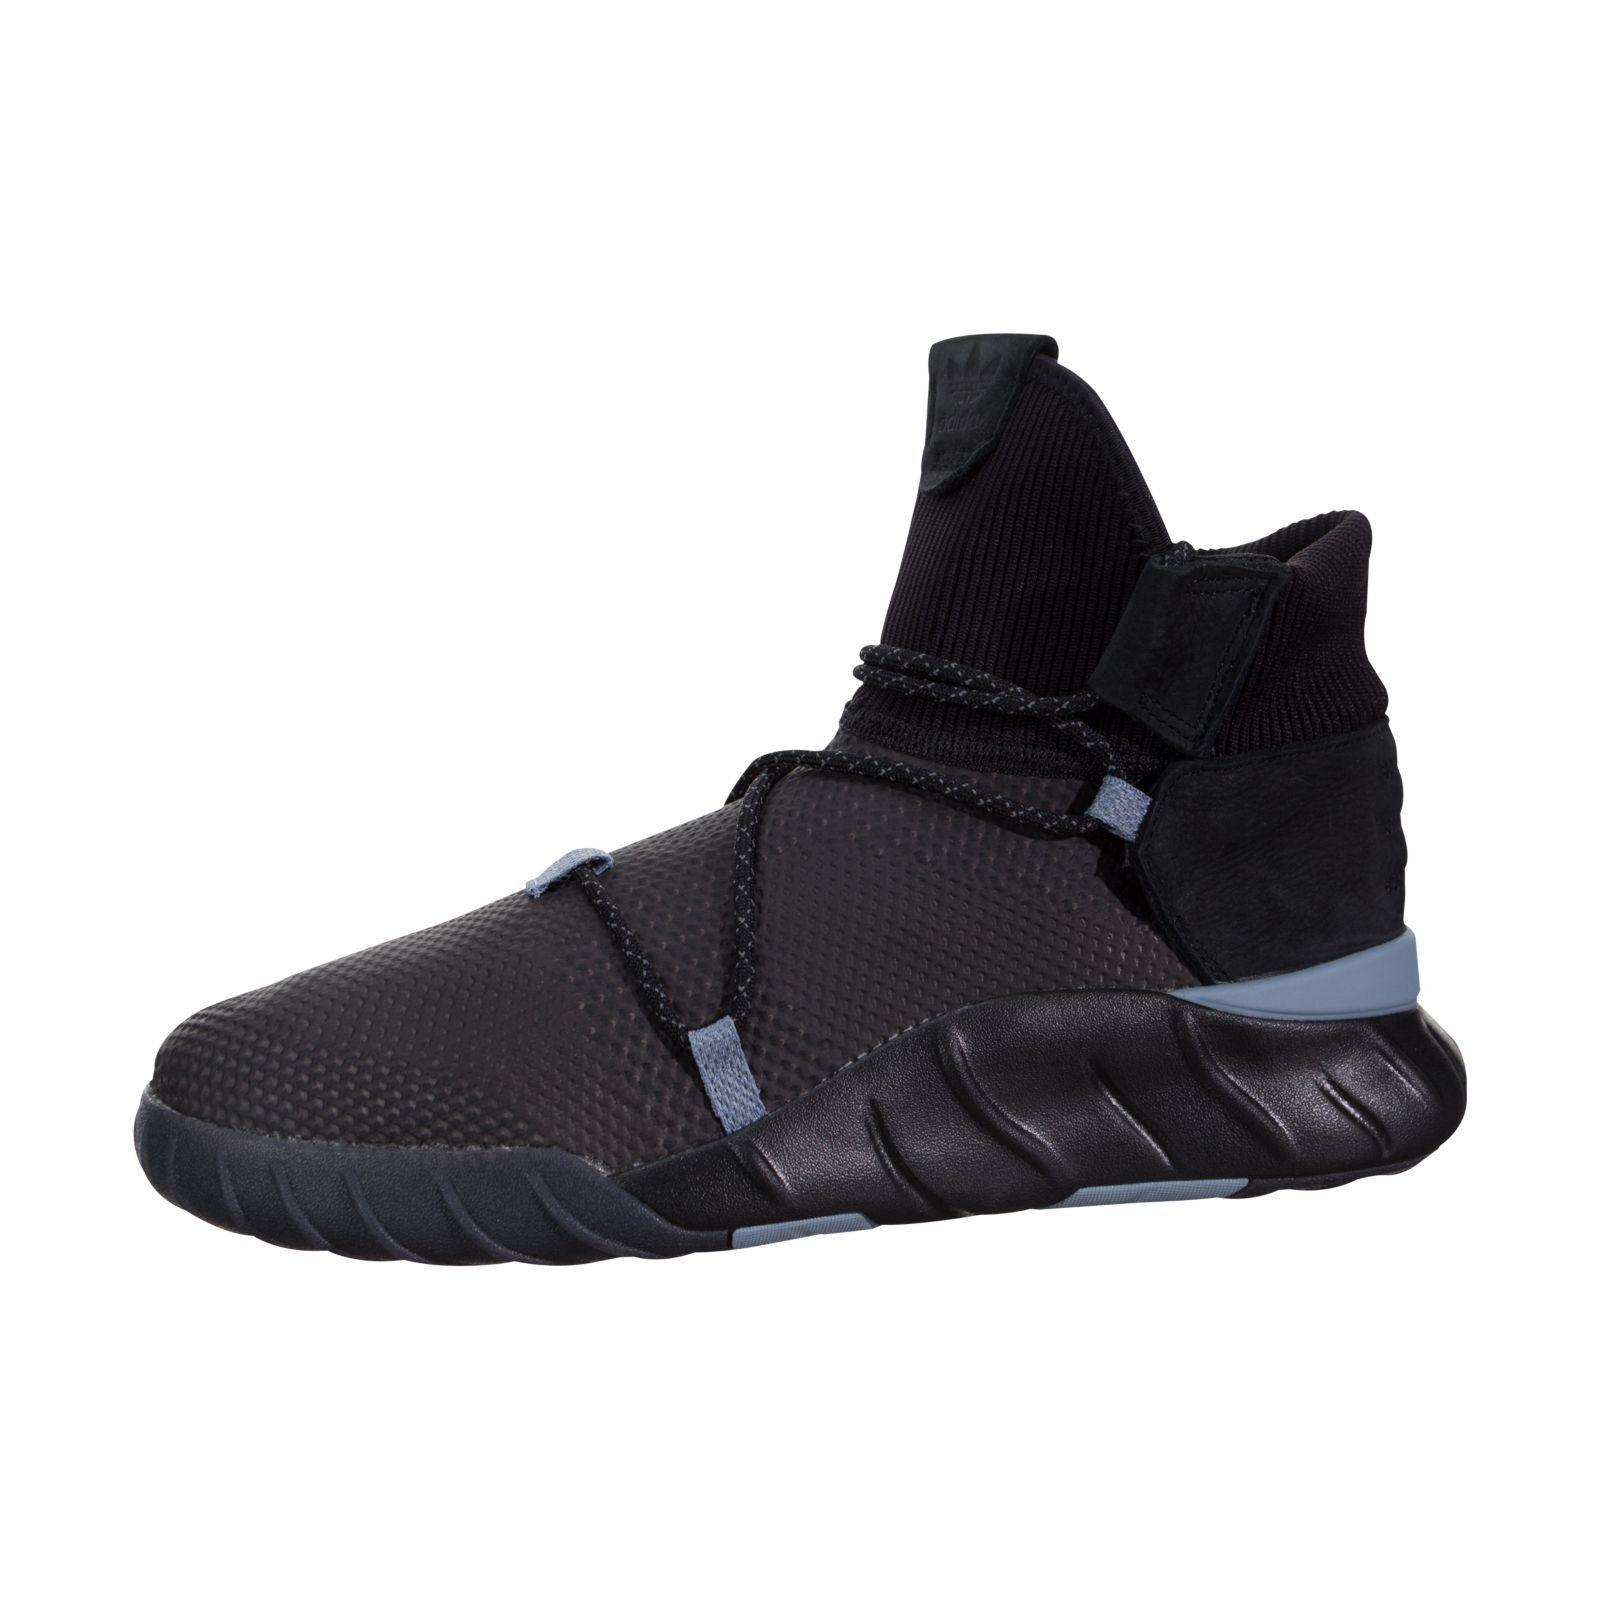 Adidas x tubulare x Adidas 2.0 (primeknit) f4d887